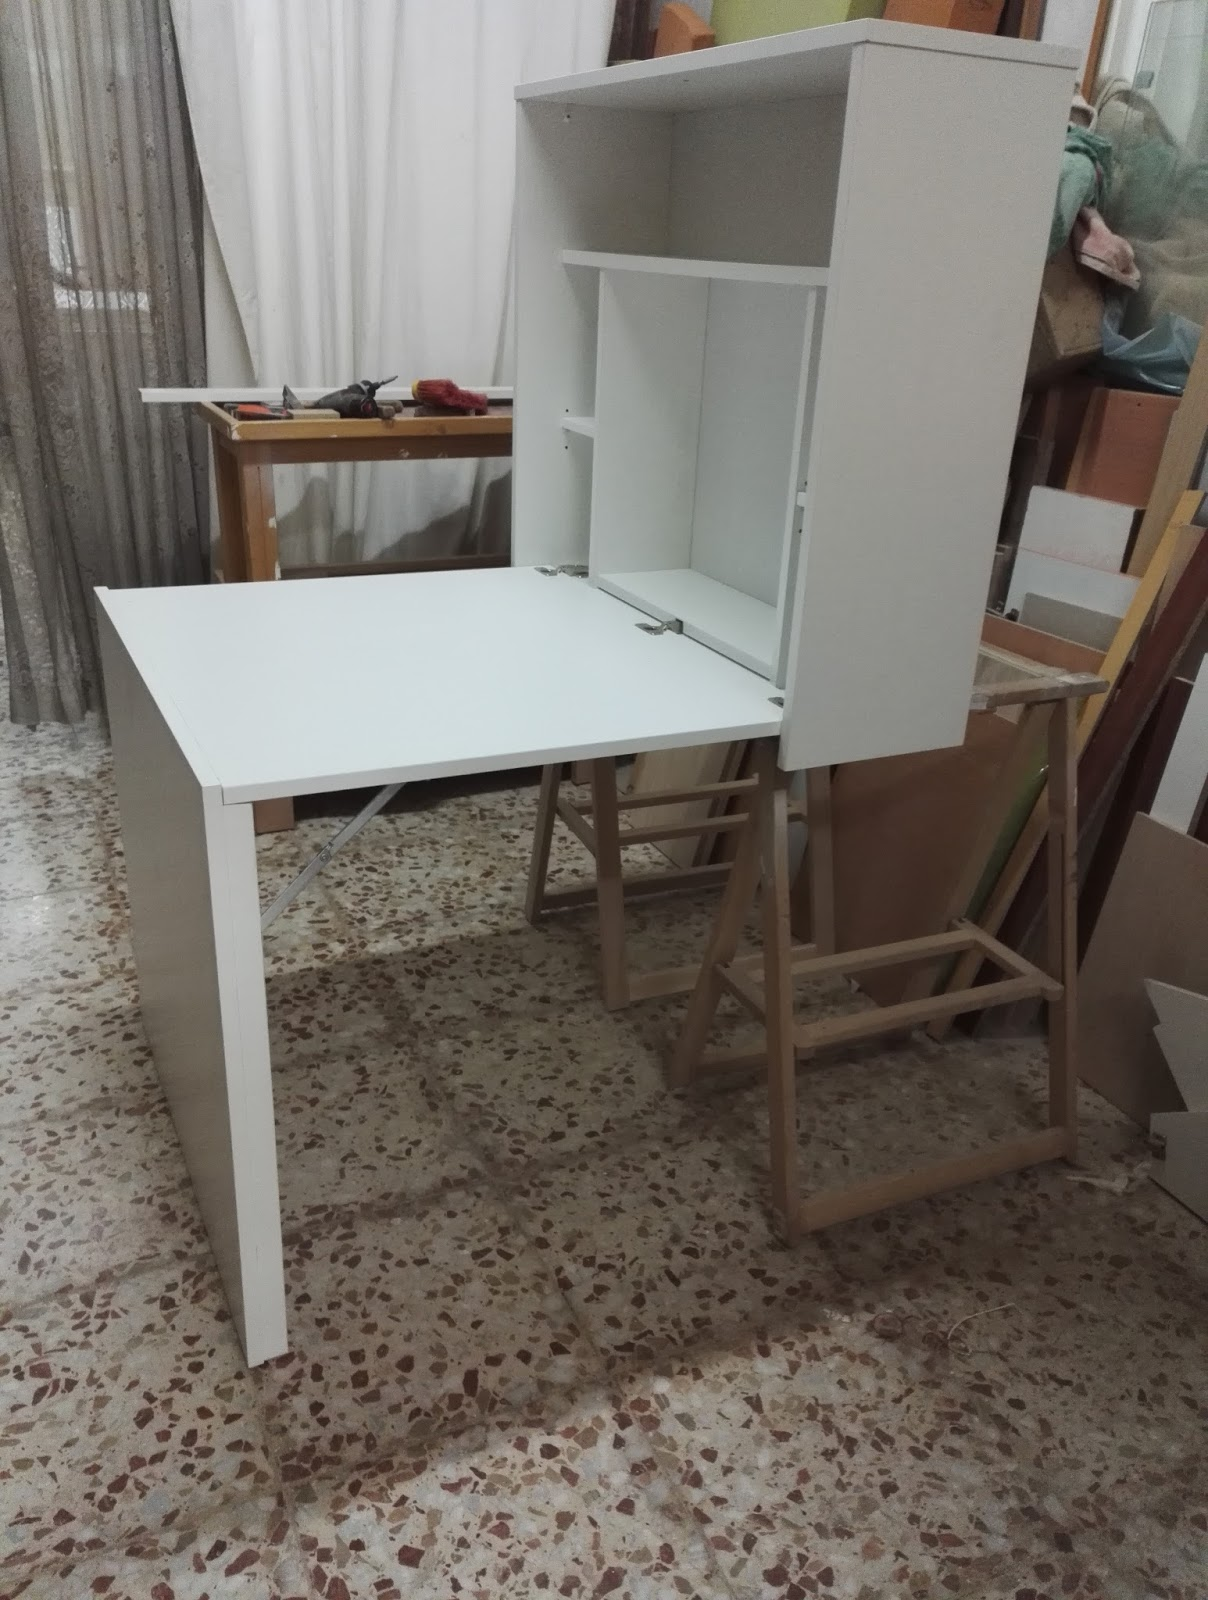 Muebles a medida mesa plegable para colgar a la pared - Mesa plegable pared ...